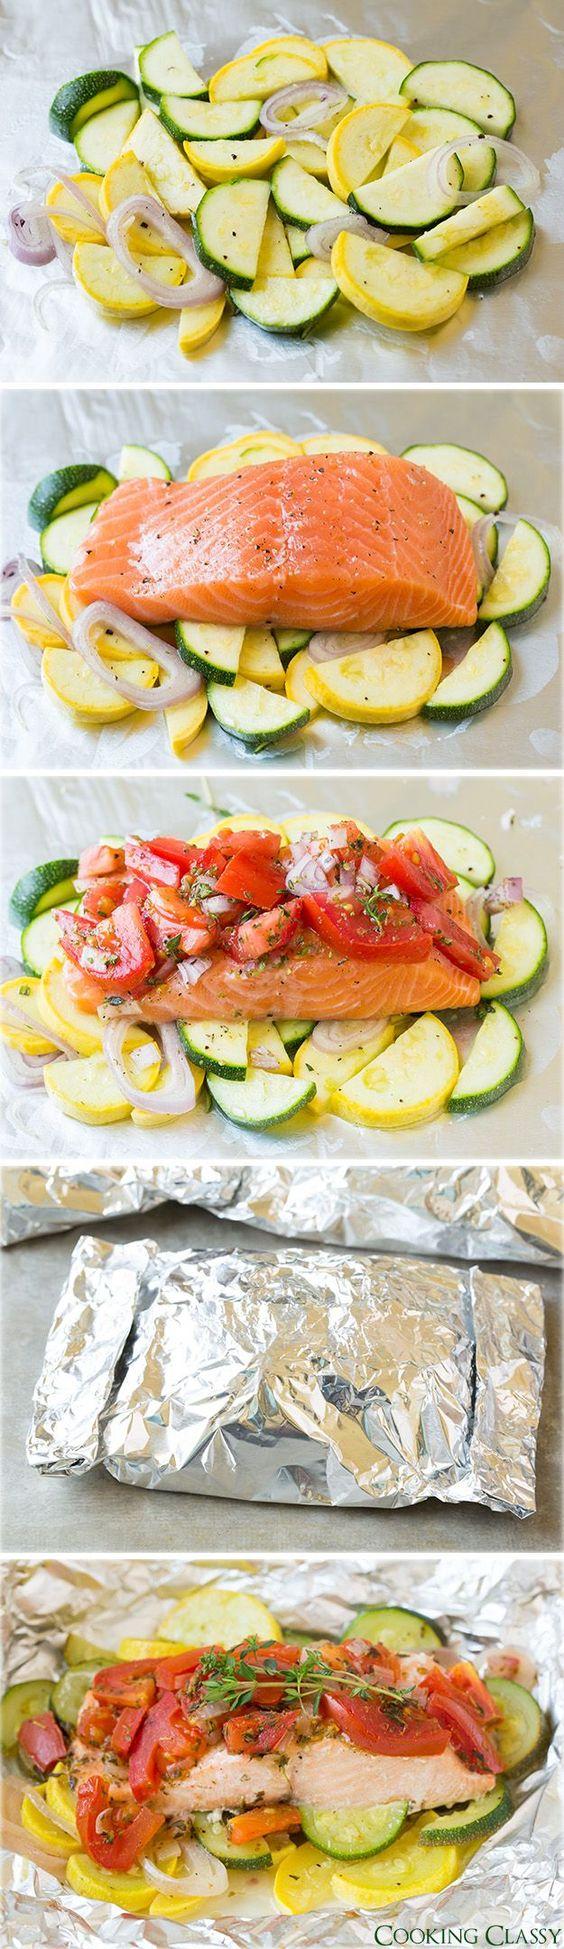 Salmon and Summer Veggies